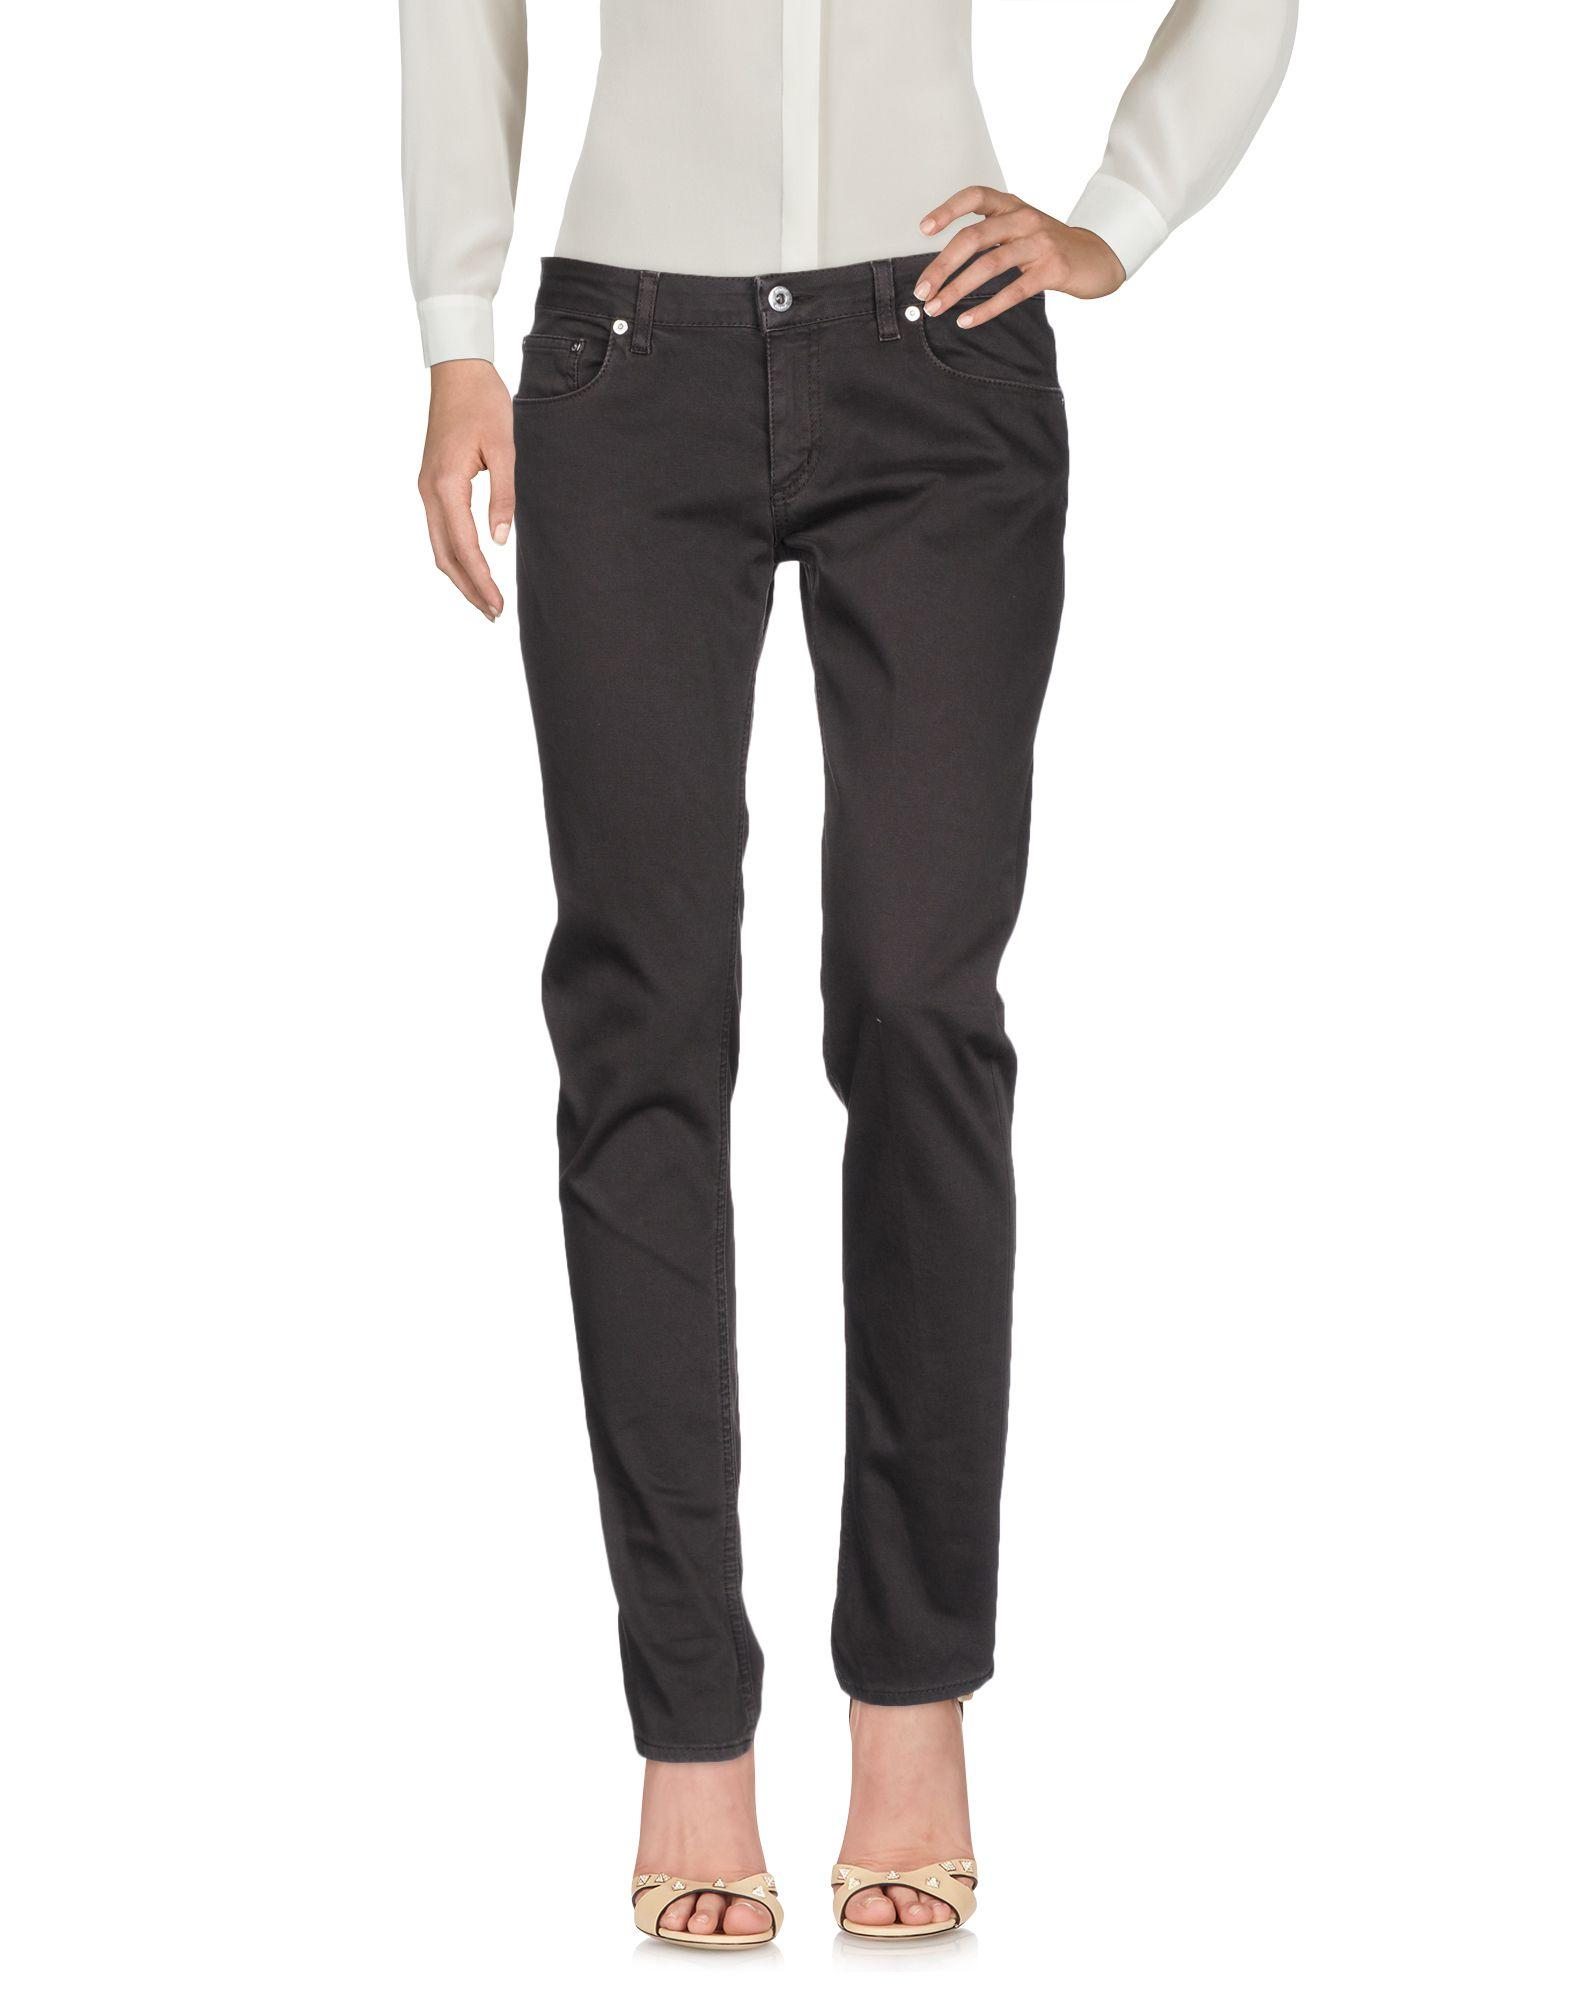 Pantalone Dondup Donna - Acquista online su cHVJcXjFtC